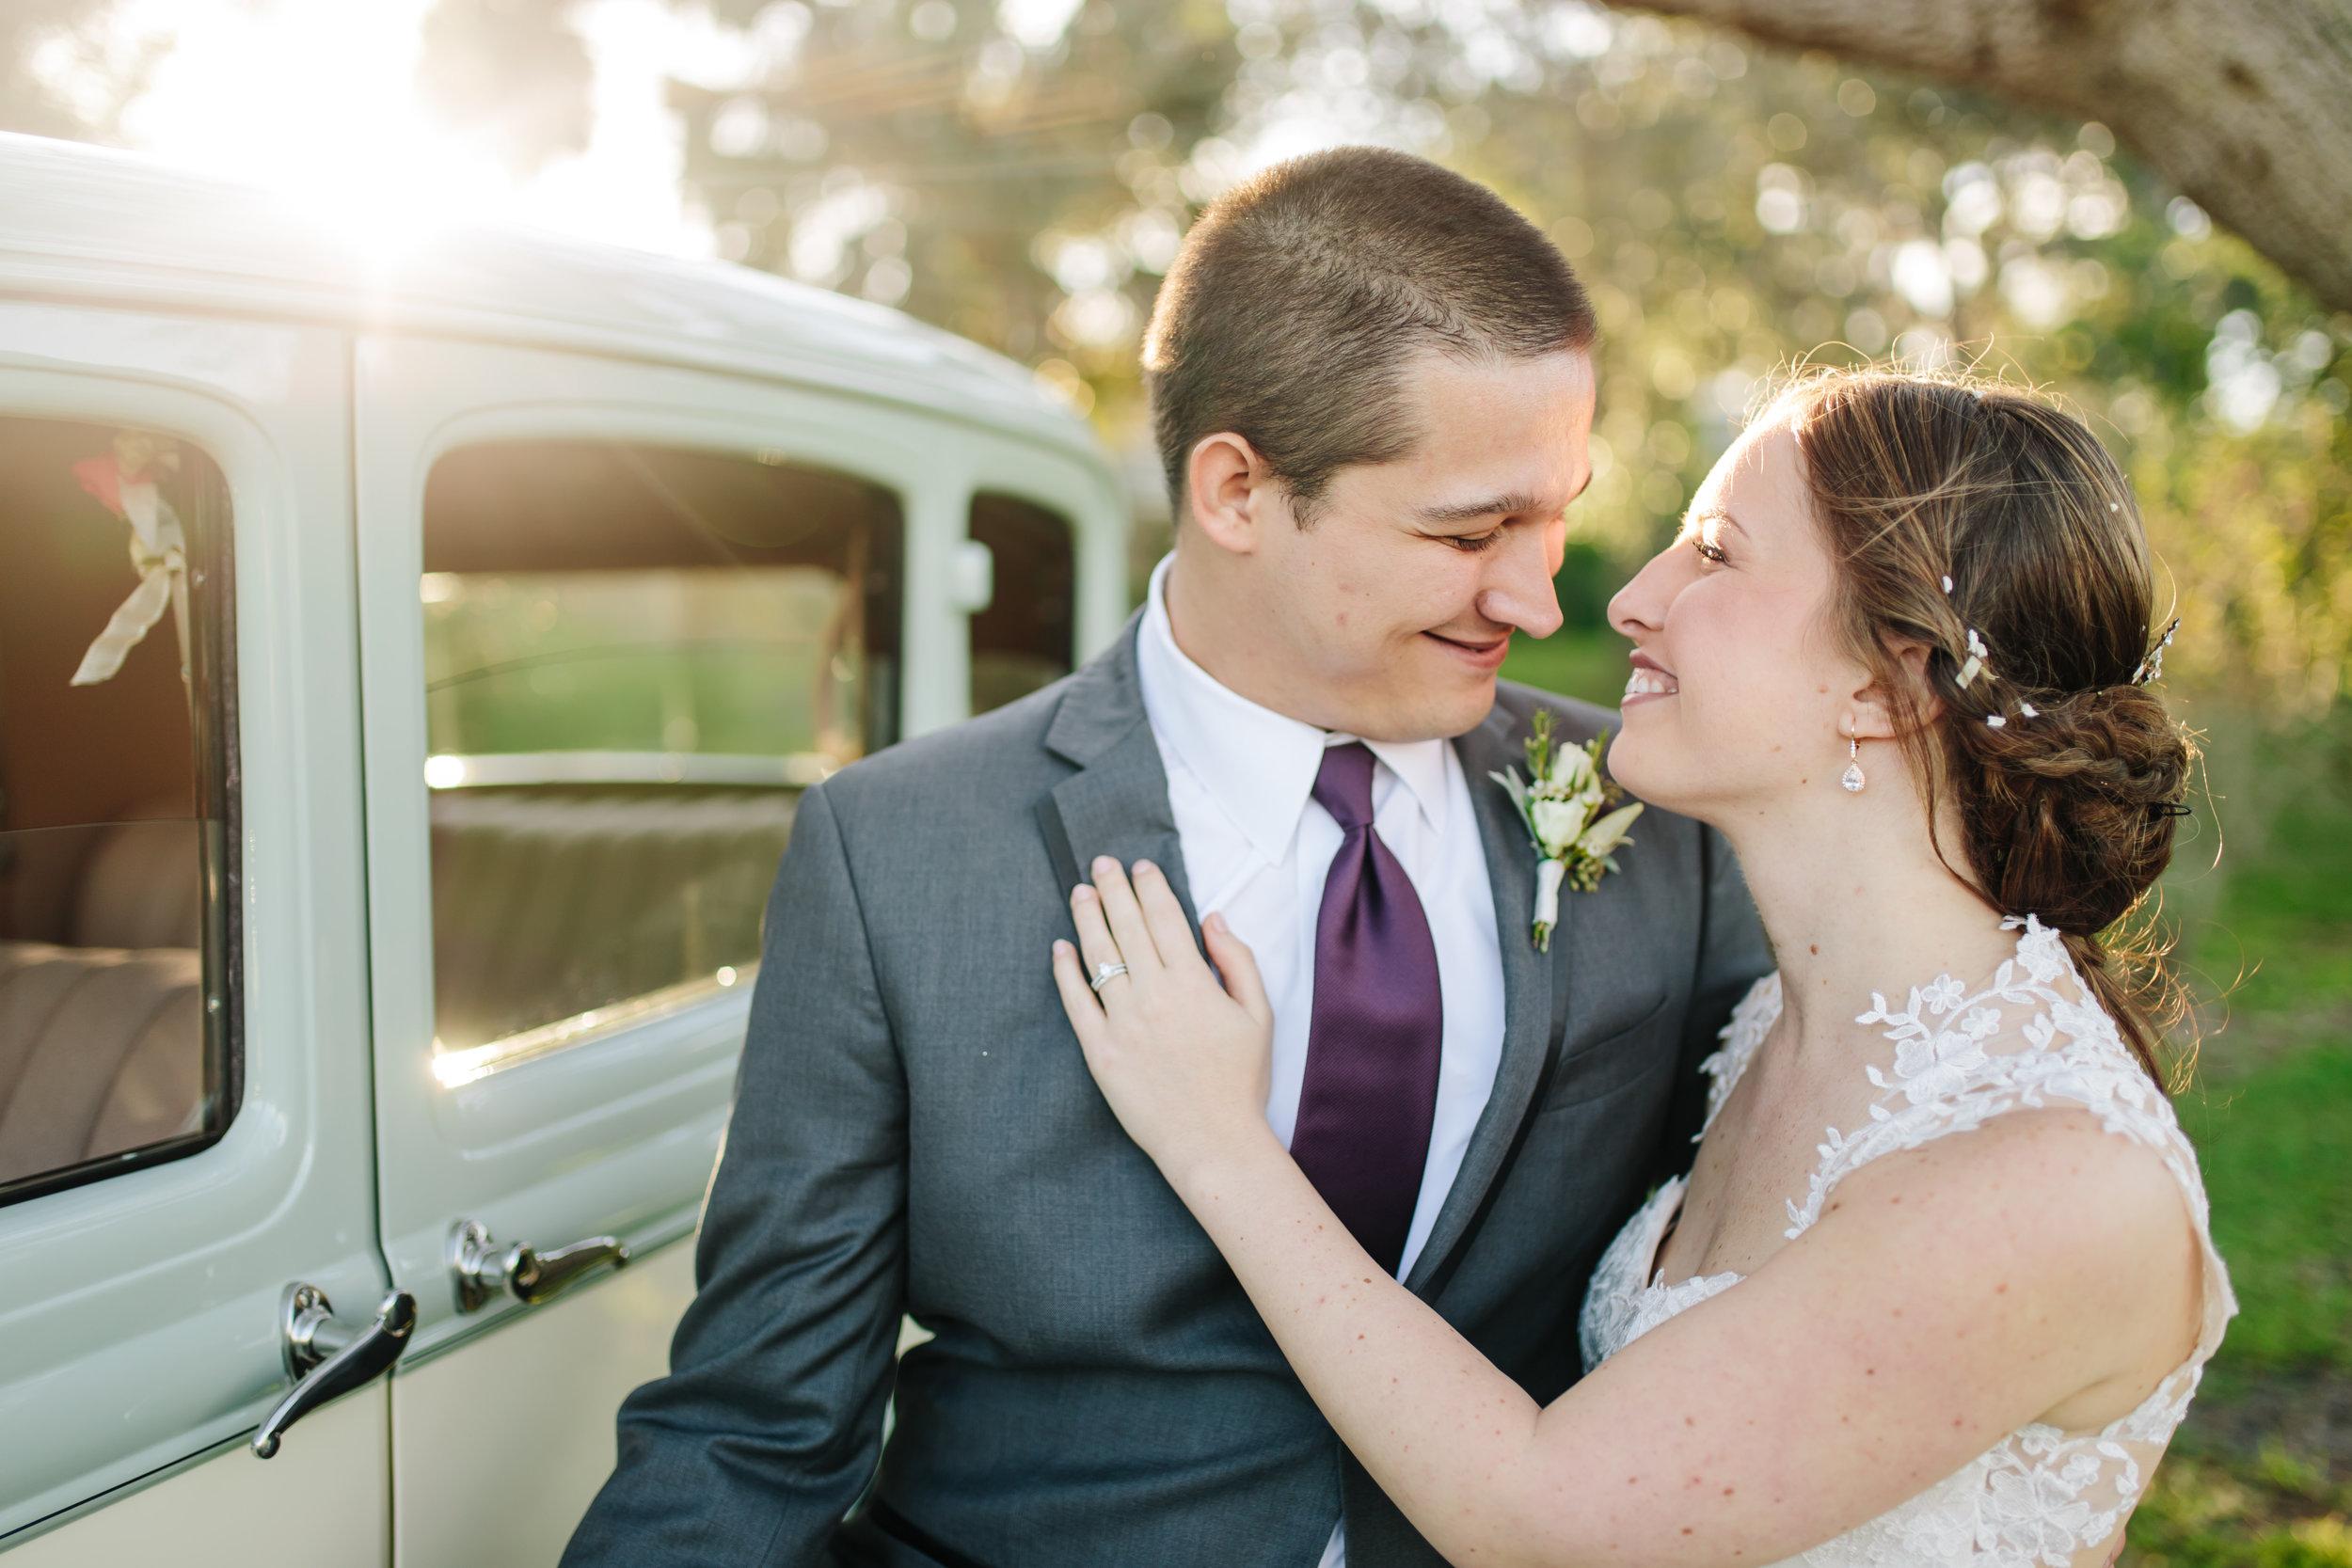 2018.02.17 Whitney and Joe Meyer Melbourne Wedding (402 of 759).jpg